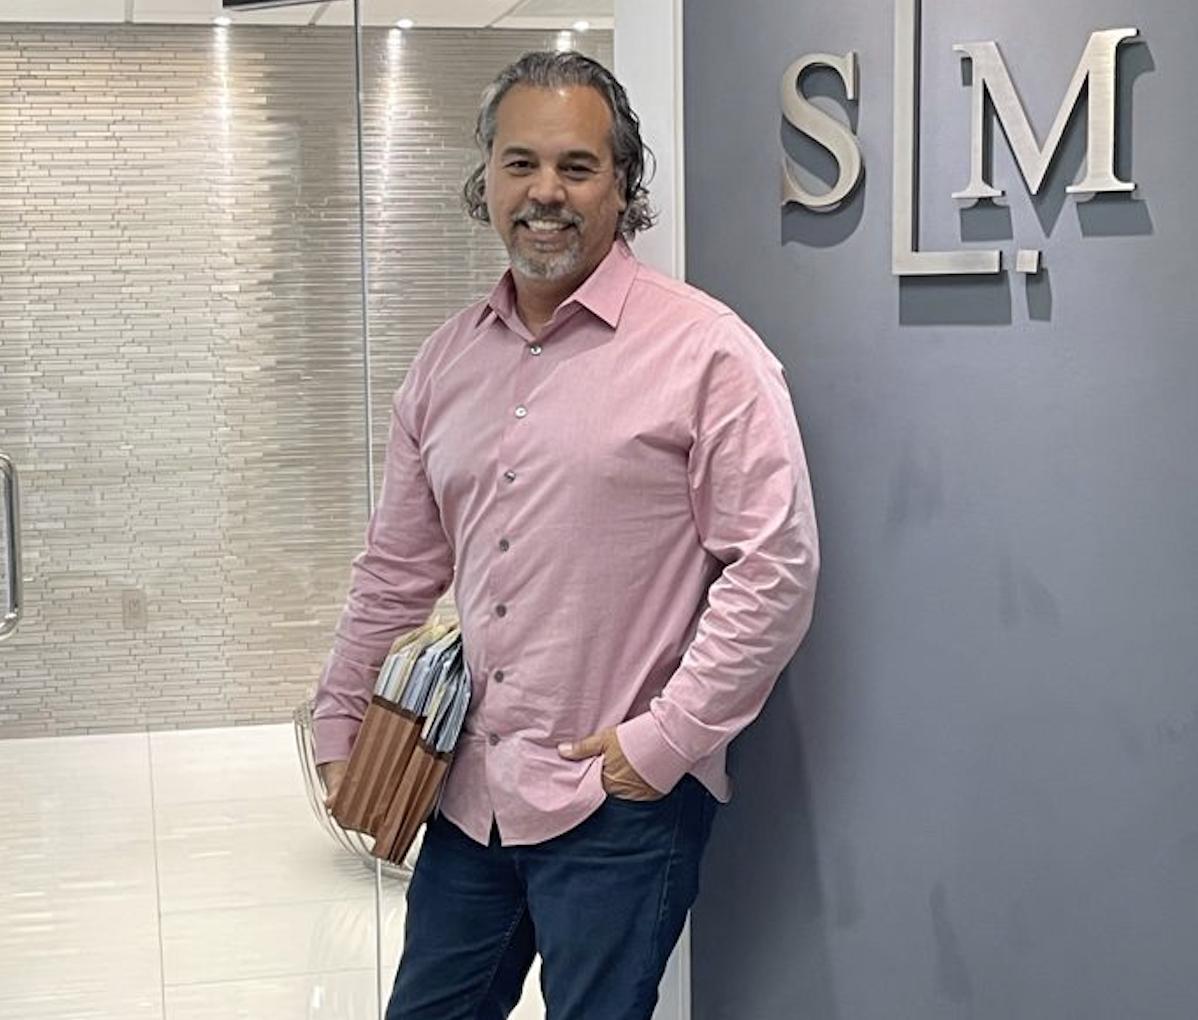 Mr. 786ABOOGADO Establishes a Powerful Presence in Miami-Dade's Hispanic Community